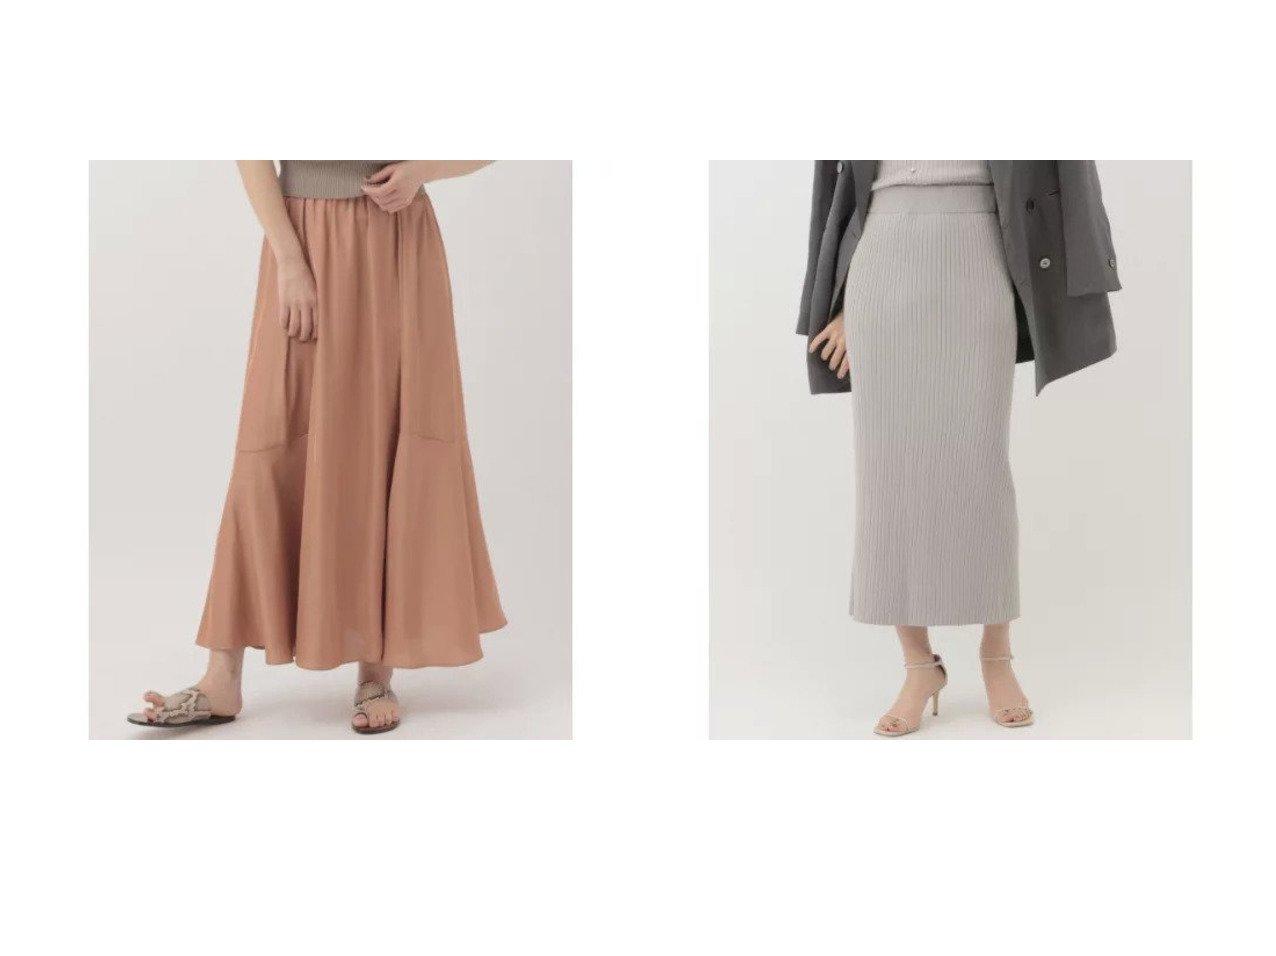 【Chaos/カオス】のメルーサテンフレアースカート&シルクリブニットスカート 【スカート】おすすめ!人気、トレンド・レディースファッションの通販 おすすめで人気の流行・トレンド、ファッションの通販商品 メンズファッション・キッズファッション・インテリア・家具・レディースファッション・服の通販 founy(ファニー) https://founy.com/ ファッション Fashion レディースファッション WOMEN スカート Skirt おすすめ Recommend シンプル セットアップ タンク ネップ フィット マキシ ロング 冬 Winter サテン シルク リラックス |ID:crp329100000029134